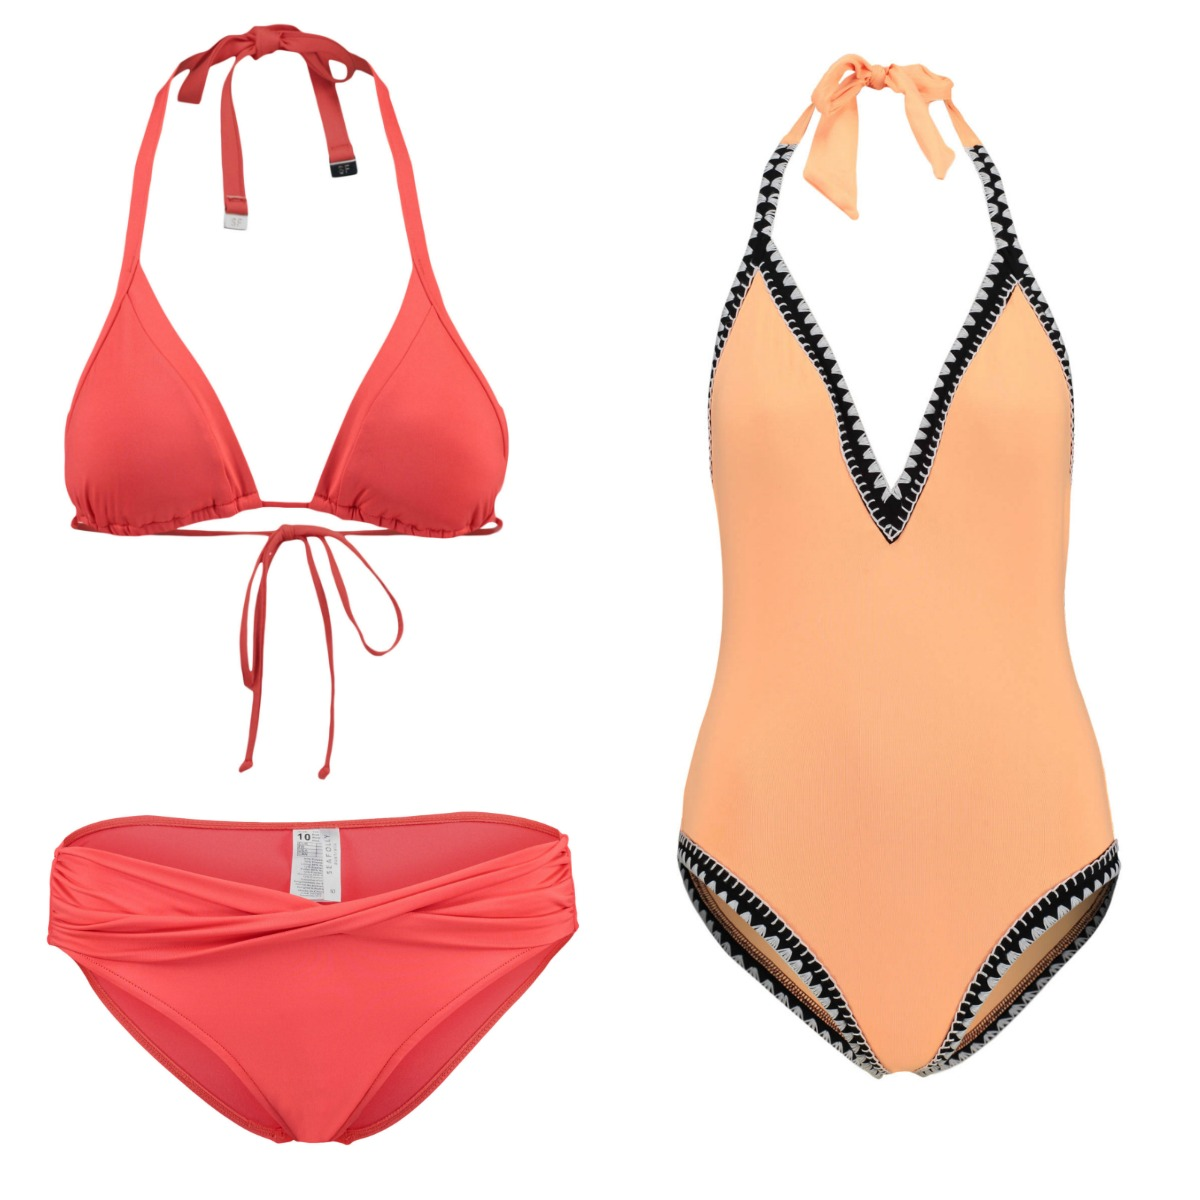 bikinis clean vs knallig wer macht das rennen fashion up your life. Black Bedroom Furniture Sets. Home Design Ideas